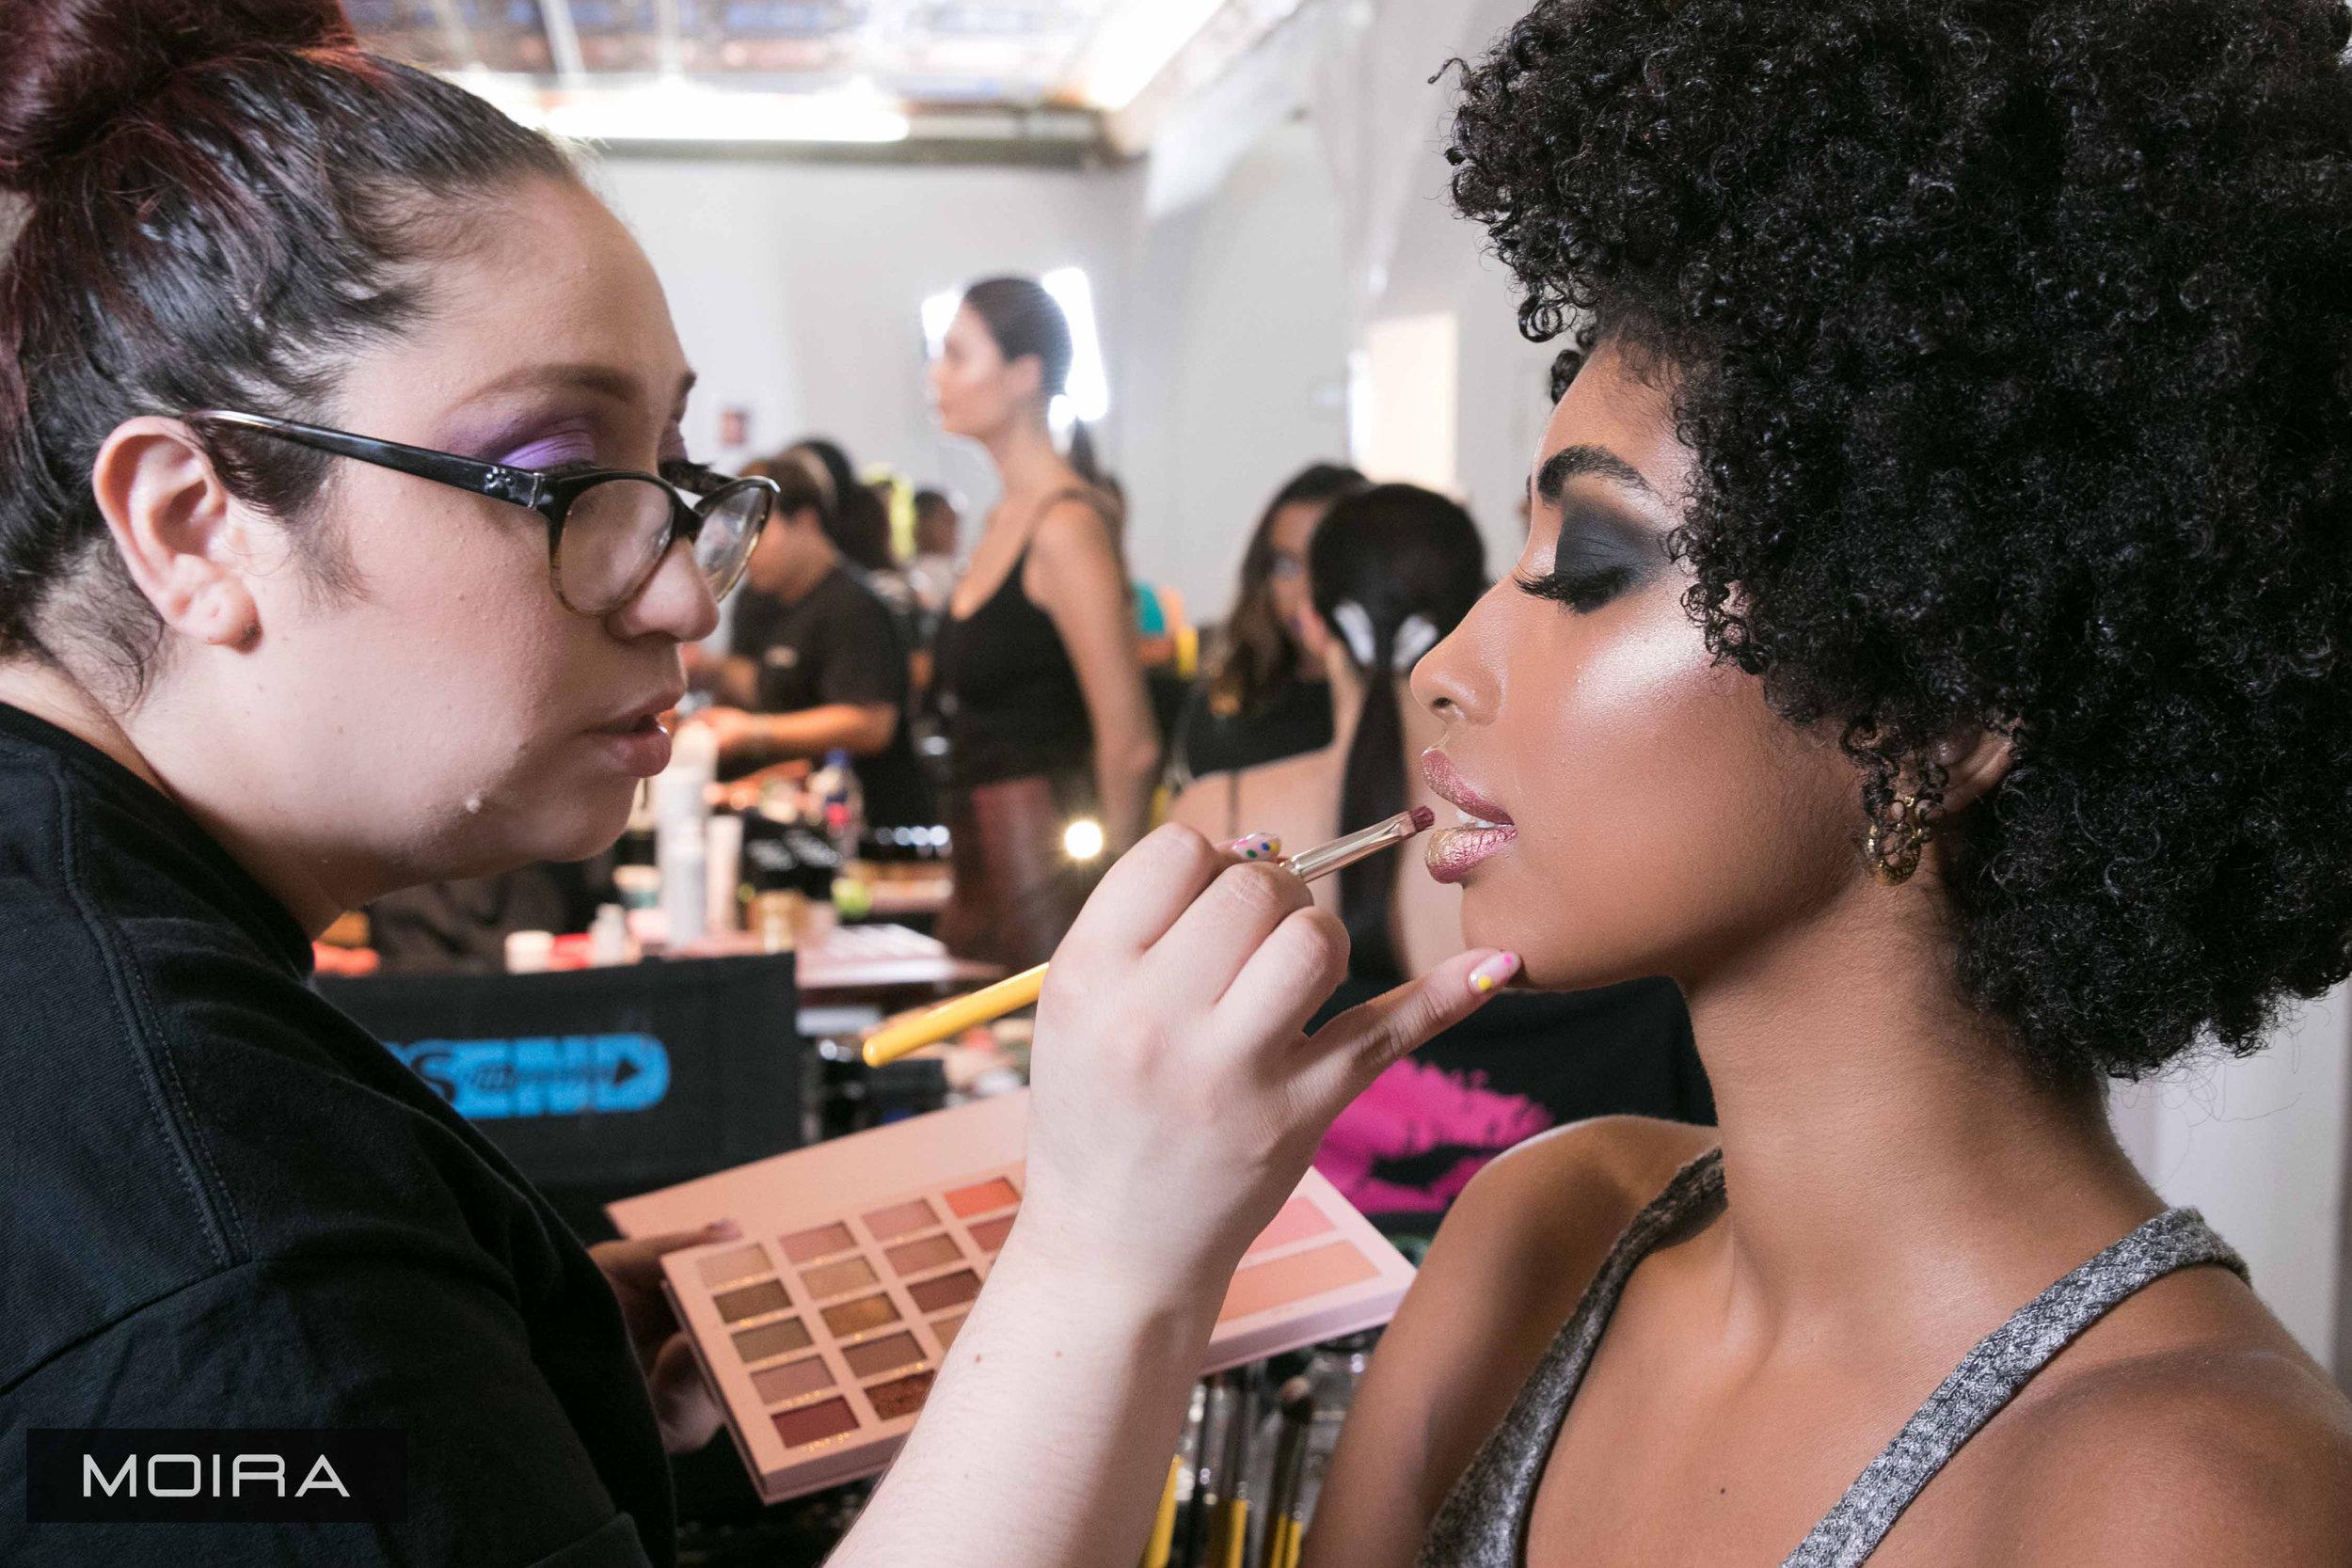 MOIRA_Cosmetics_New_York_Fashion_Week_2018-18.jpg